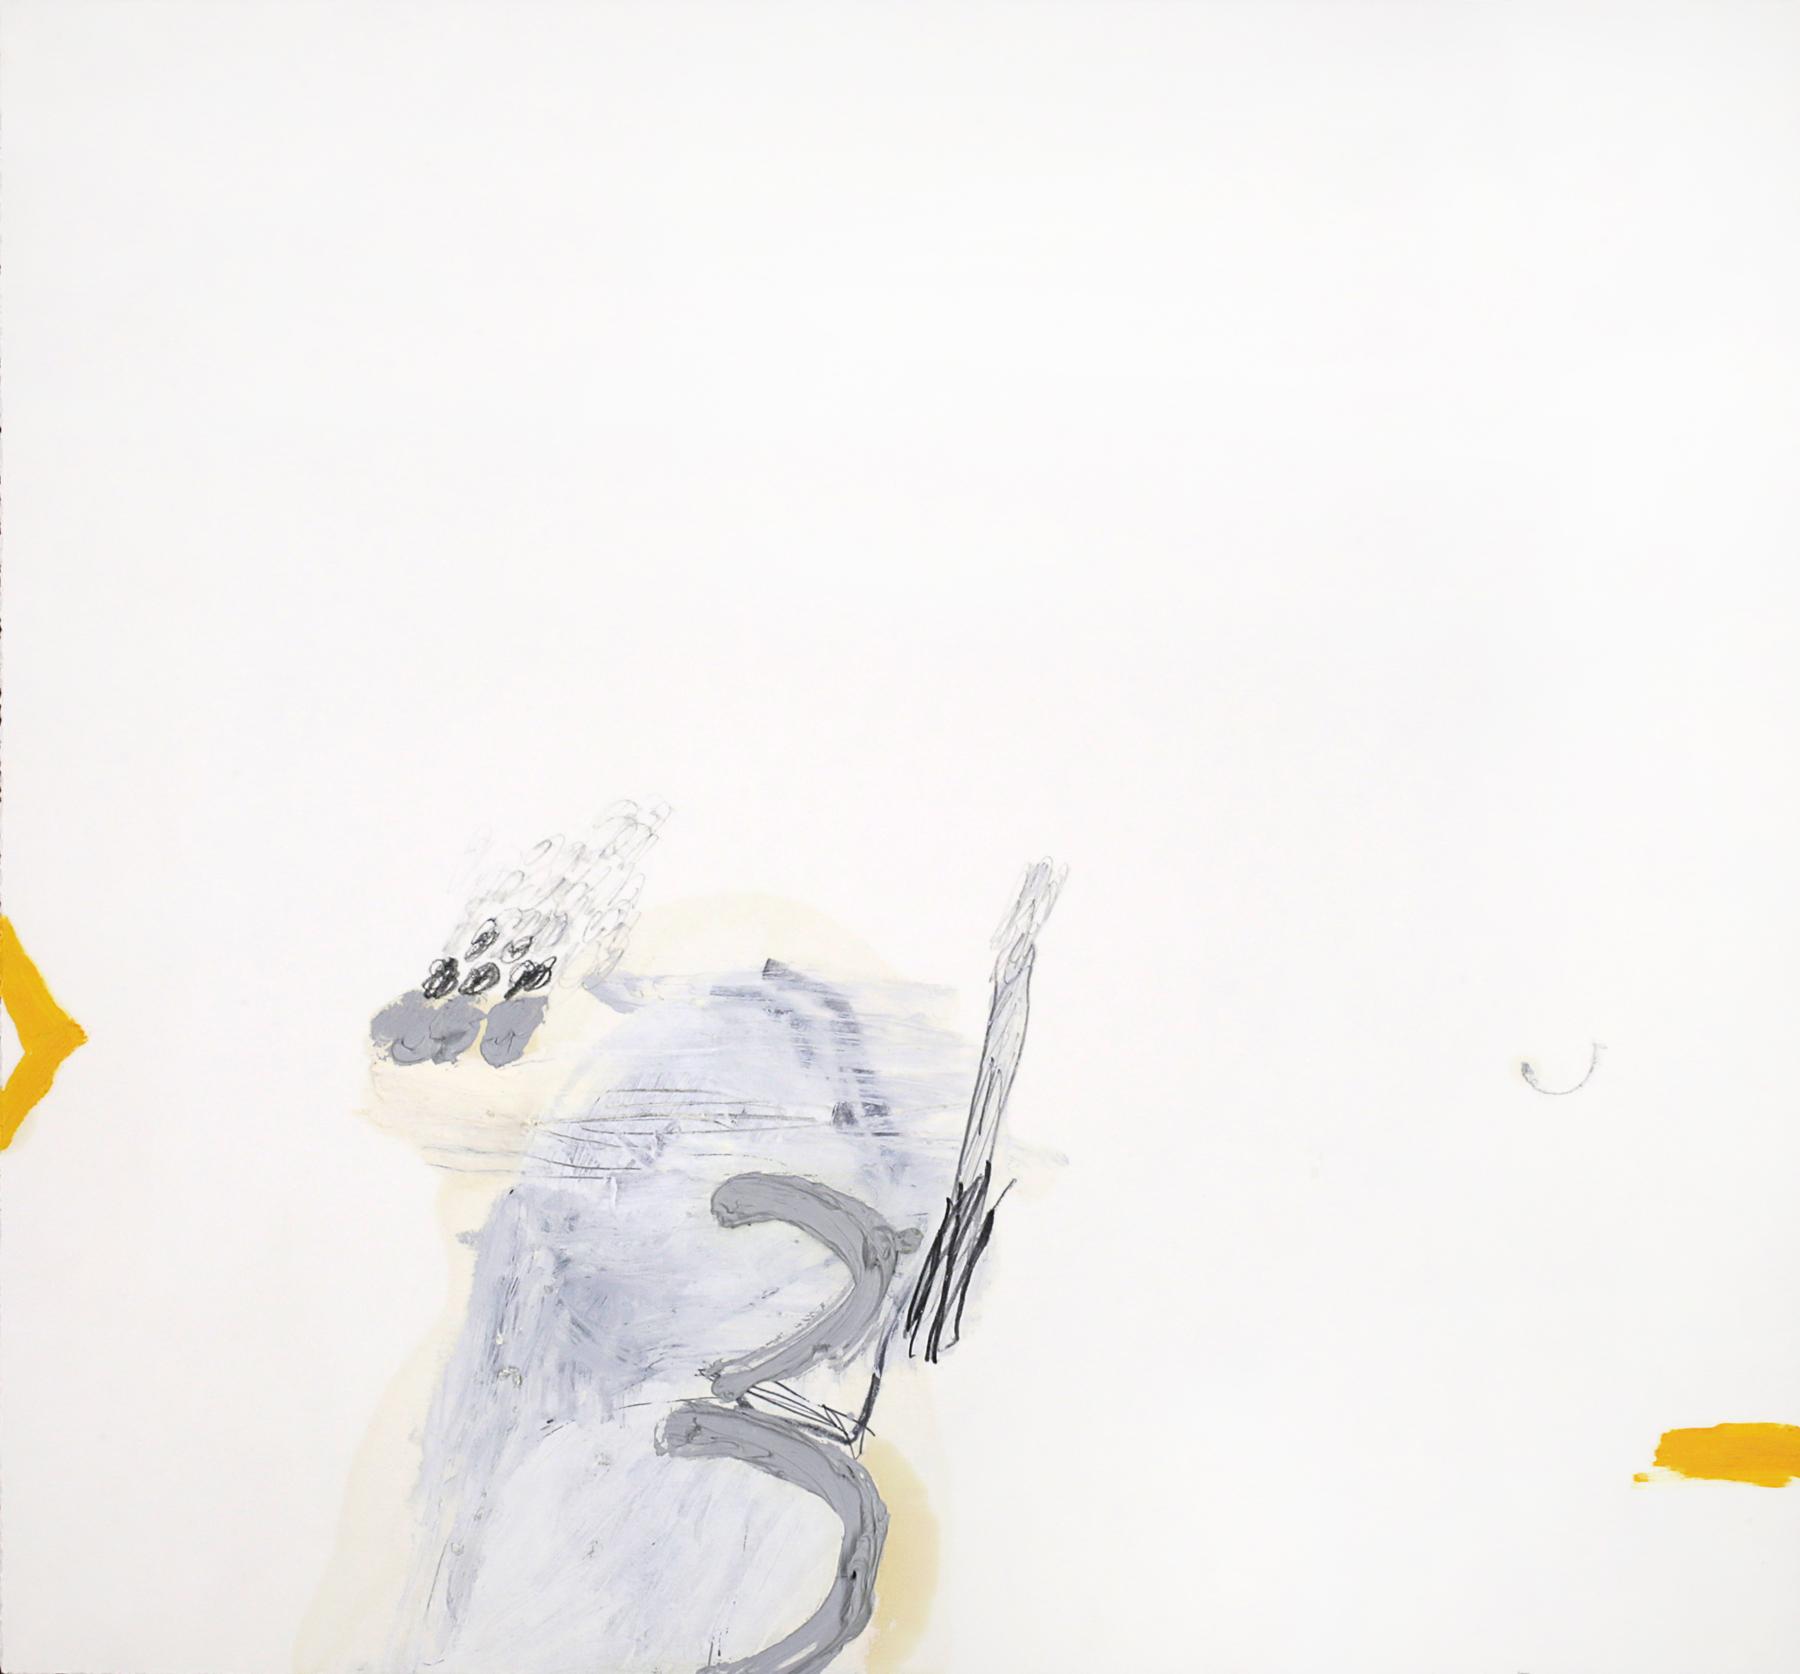 57_yellow_gray3_150_sm